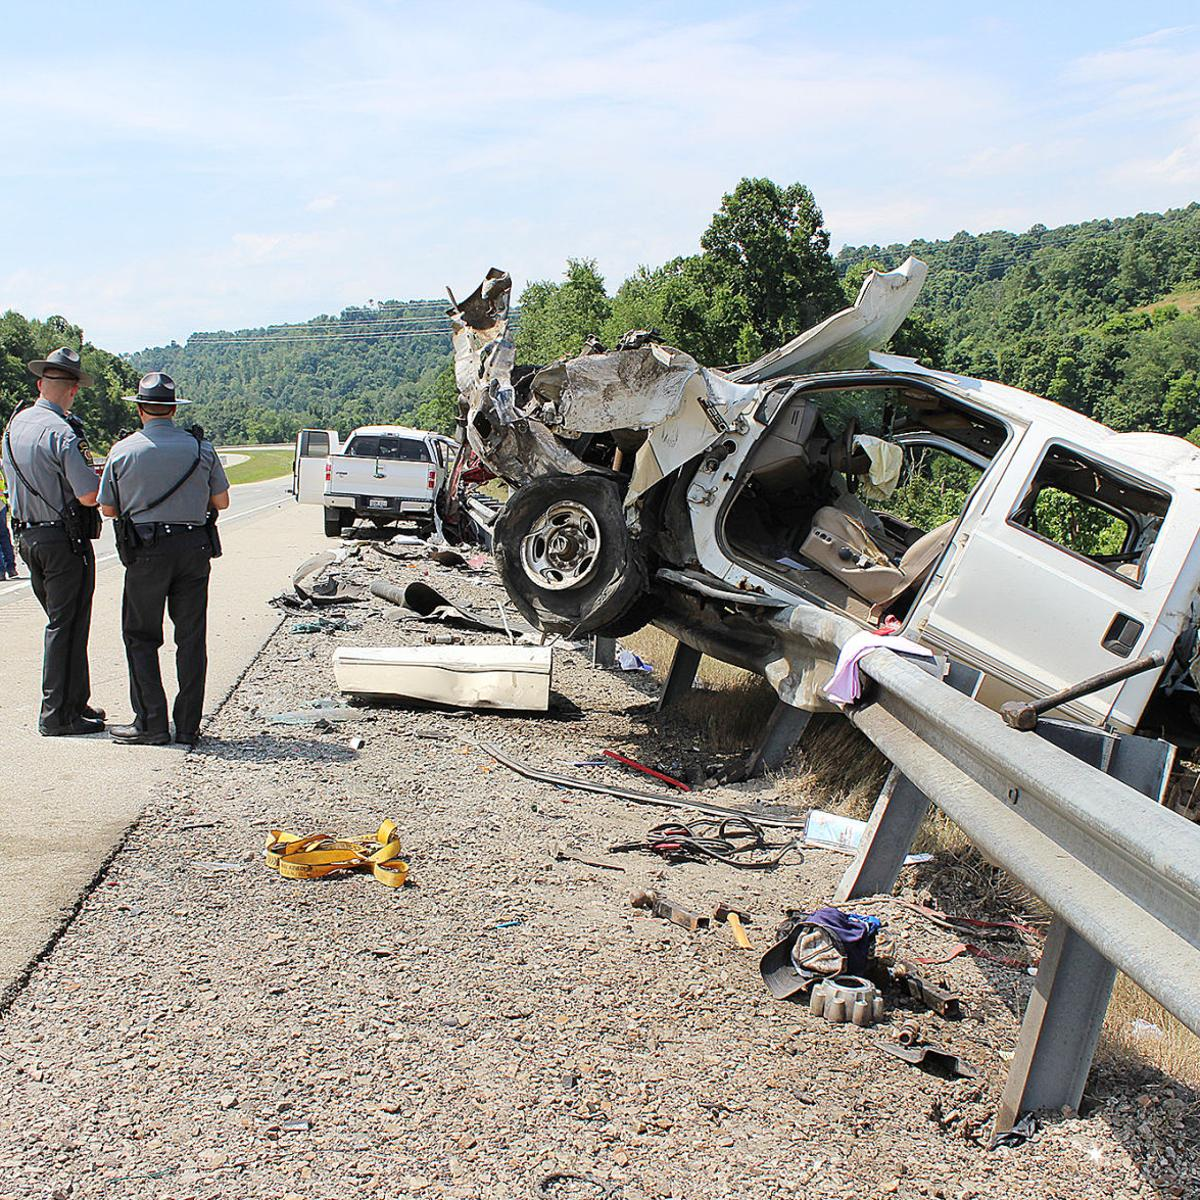 Vehicle malfunction causes multi-vehicle crash on I-79 in Greene